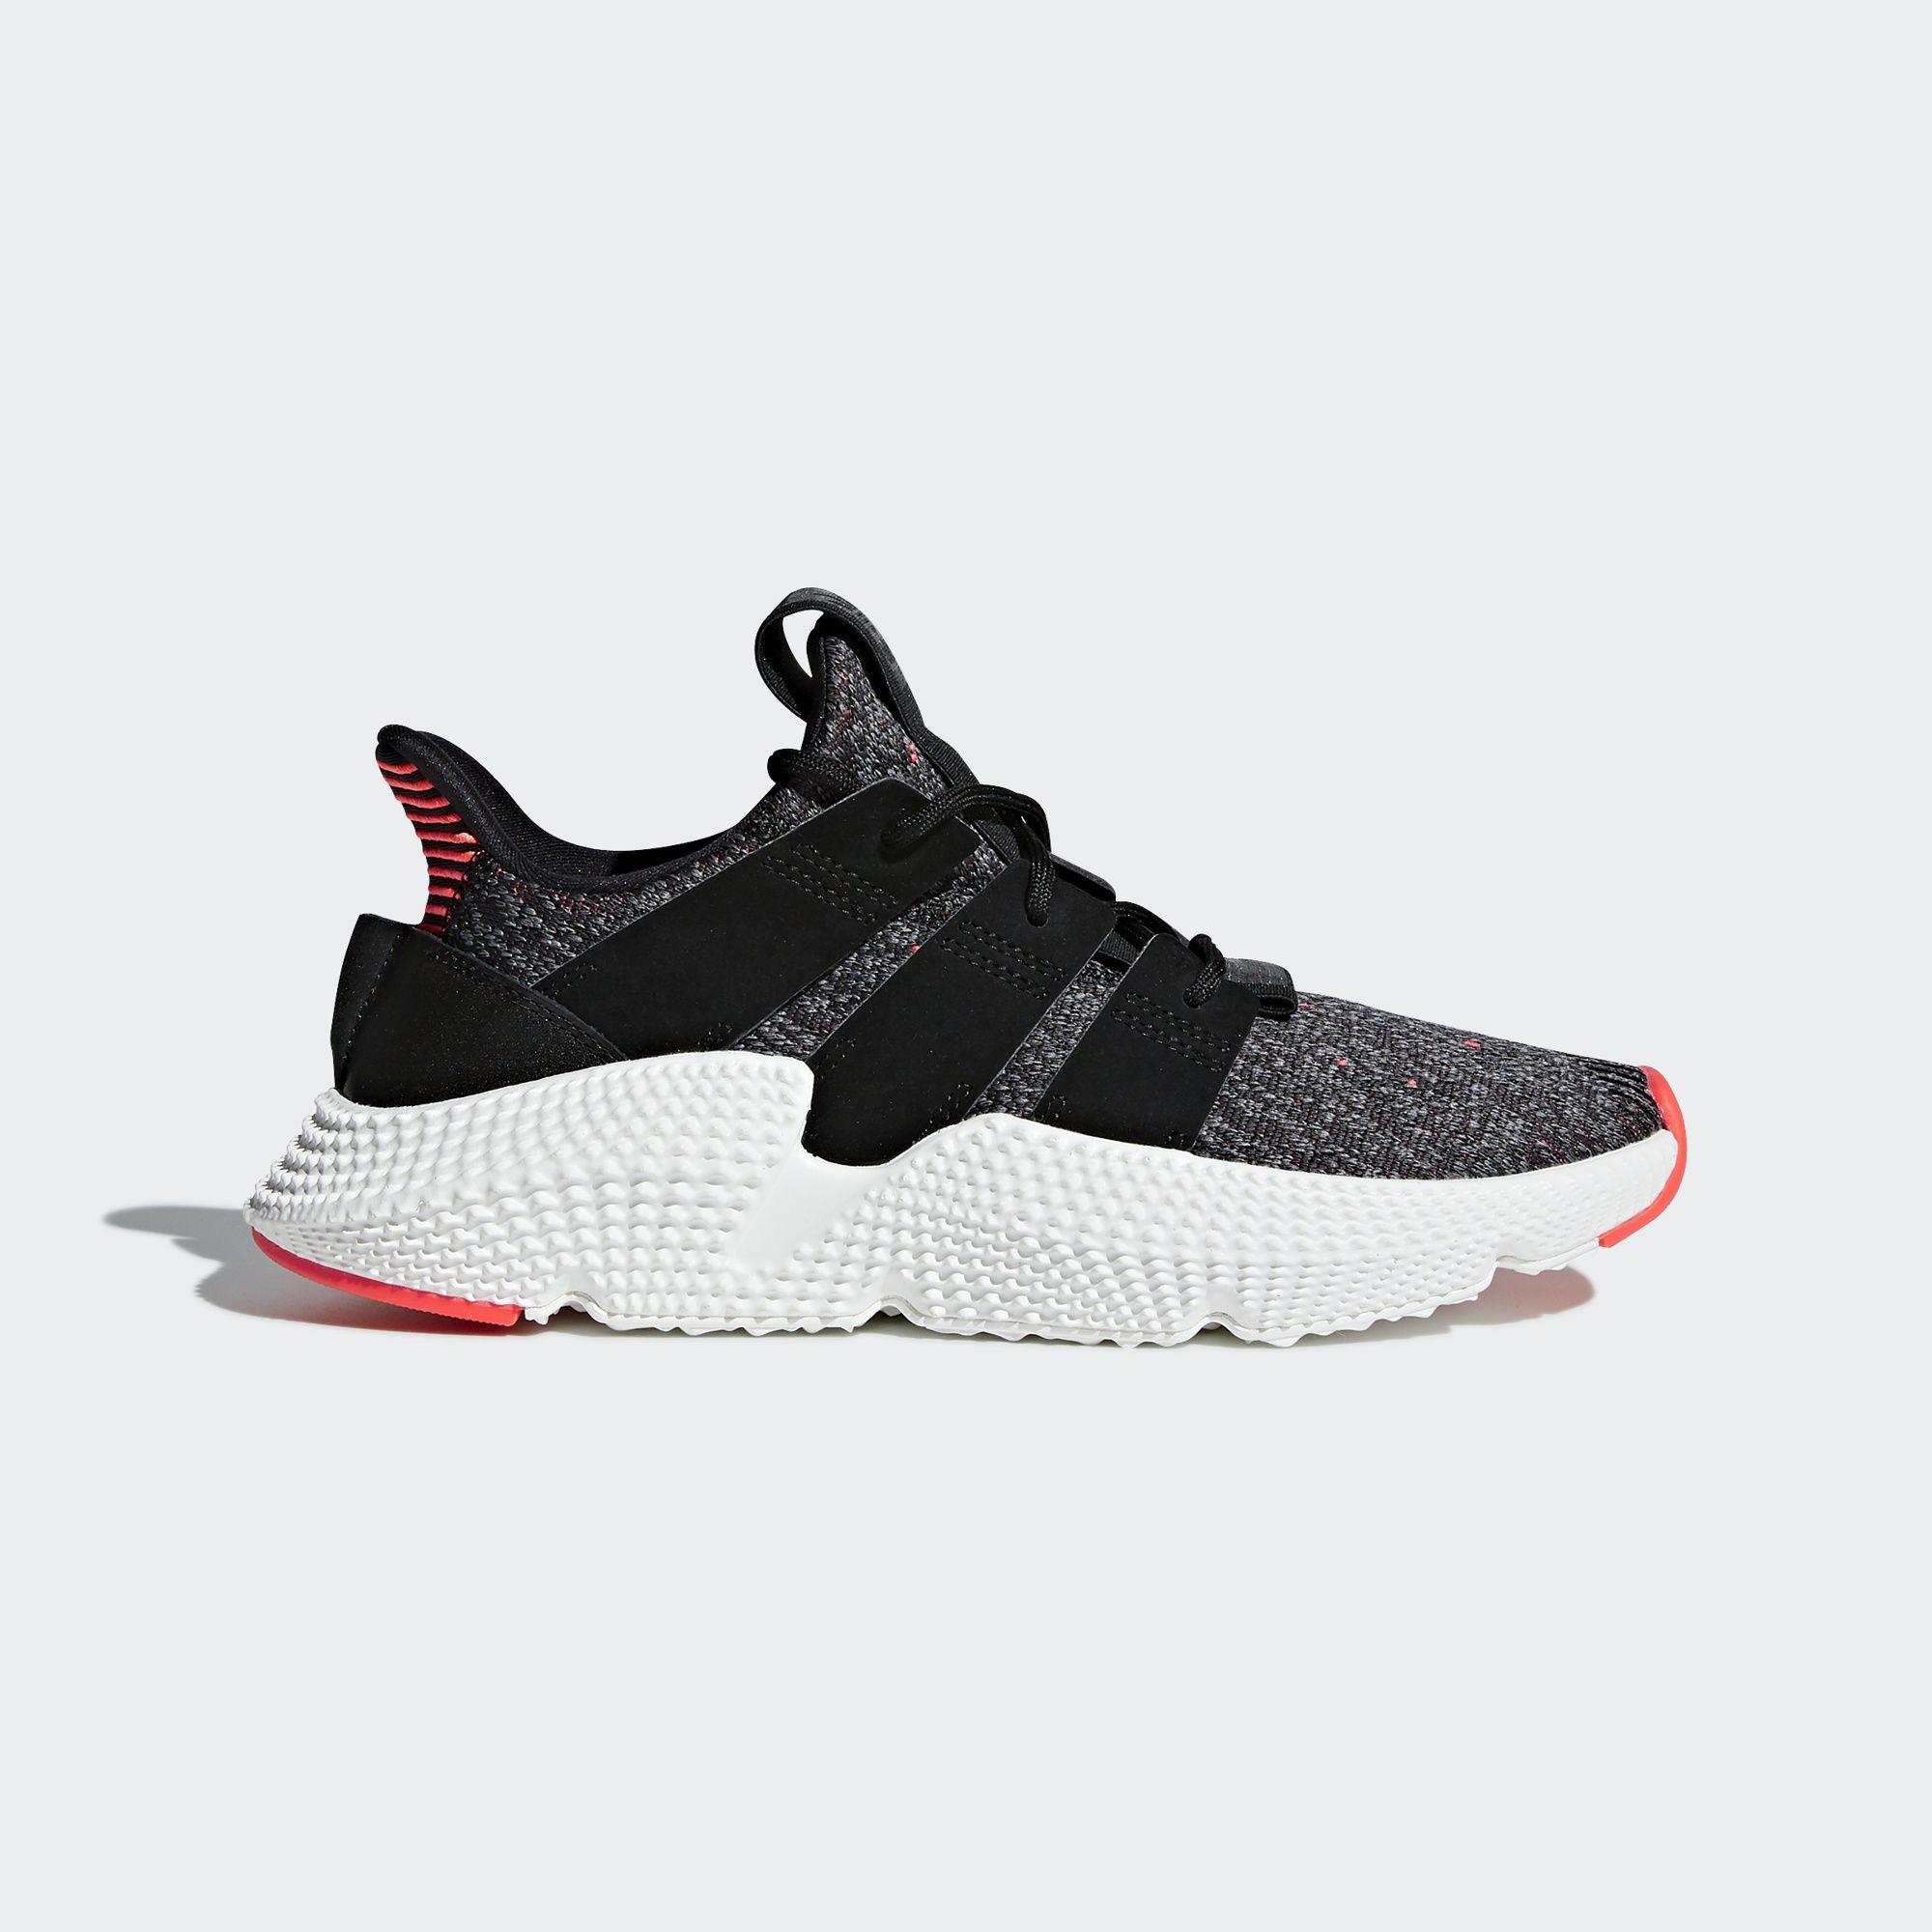 Adidas Prophere Scarpe Femminili Scarpe Adidas, Nero Adidas E